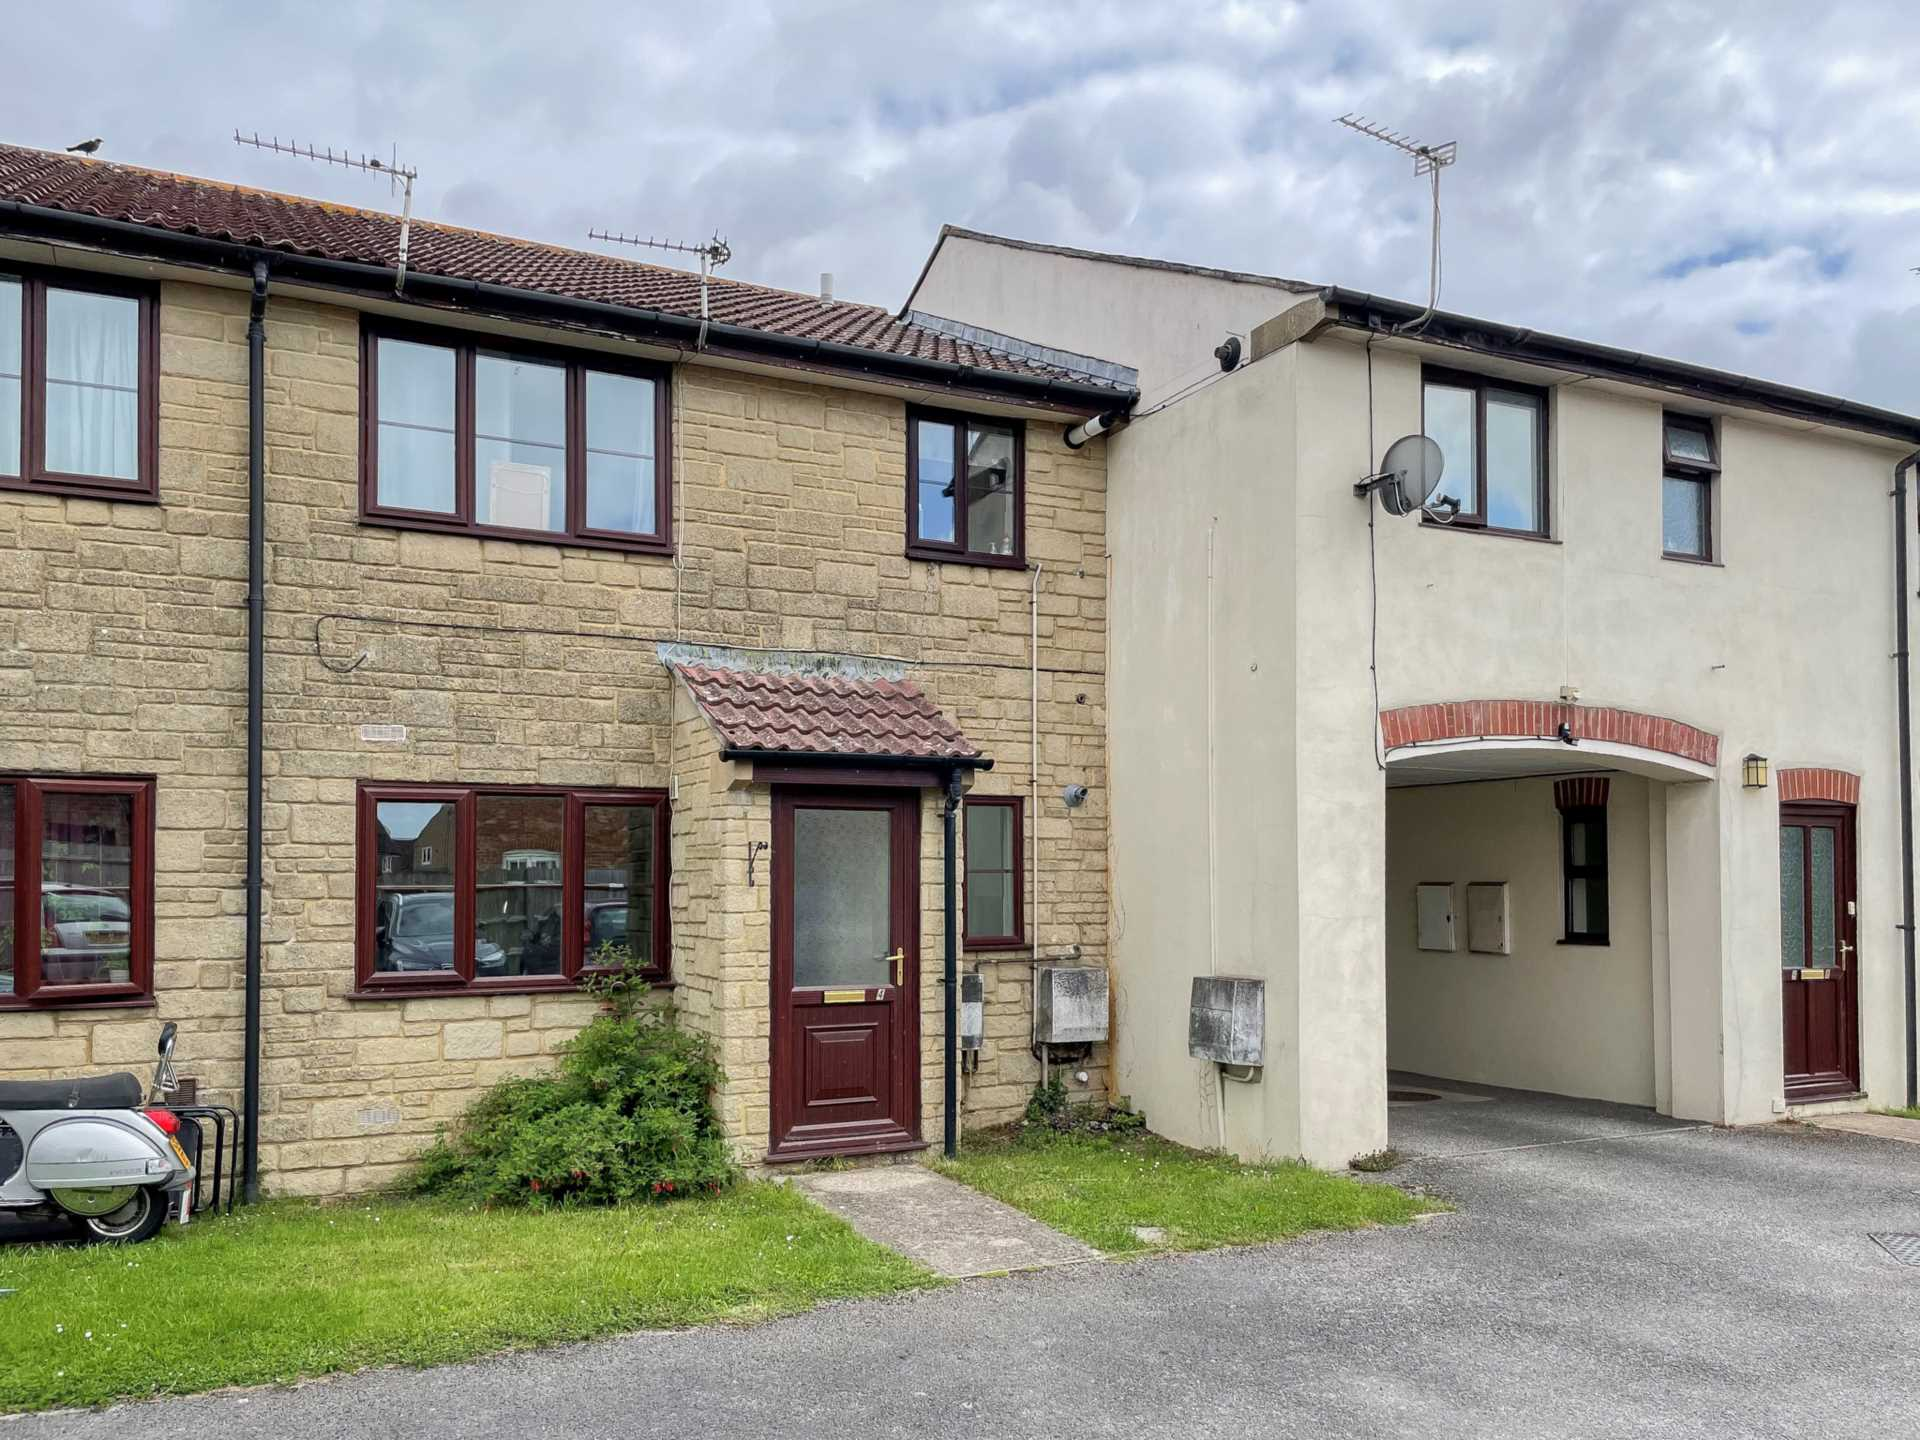 1 bed flat to rent in Ham Court, Gillingham, Gillingham  - Property Image 1